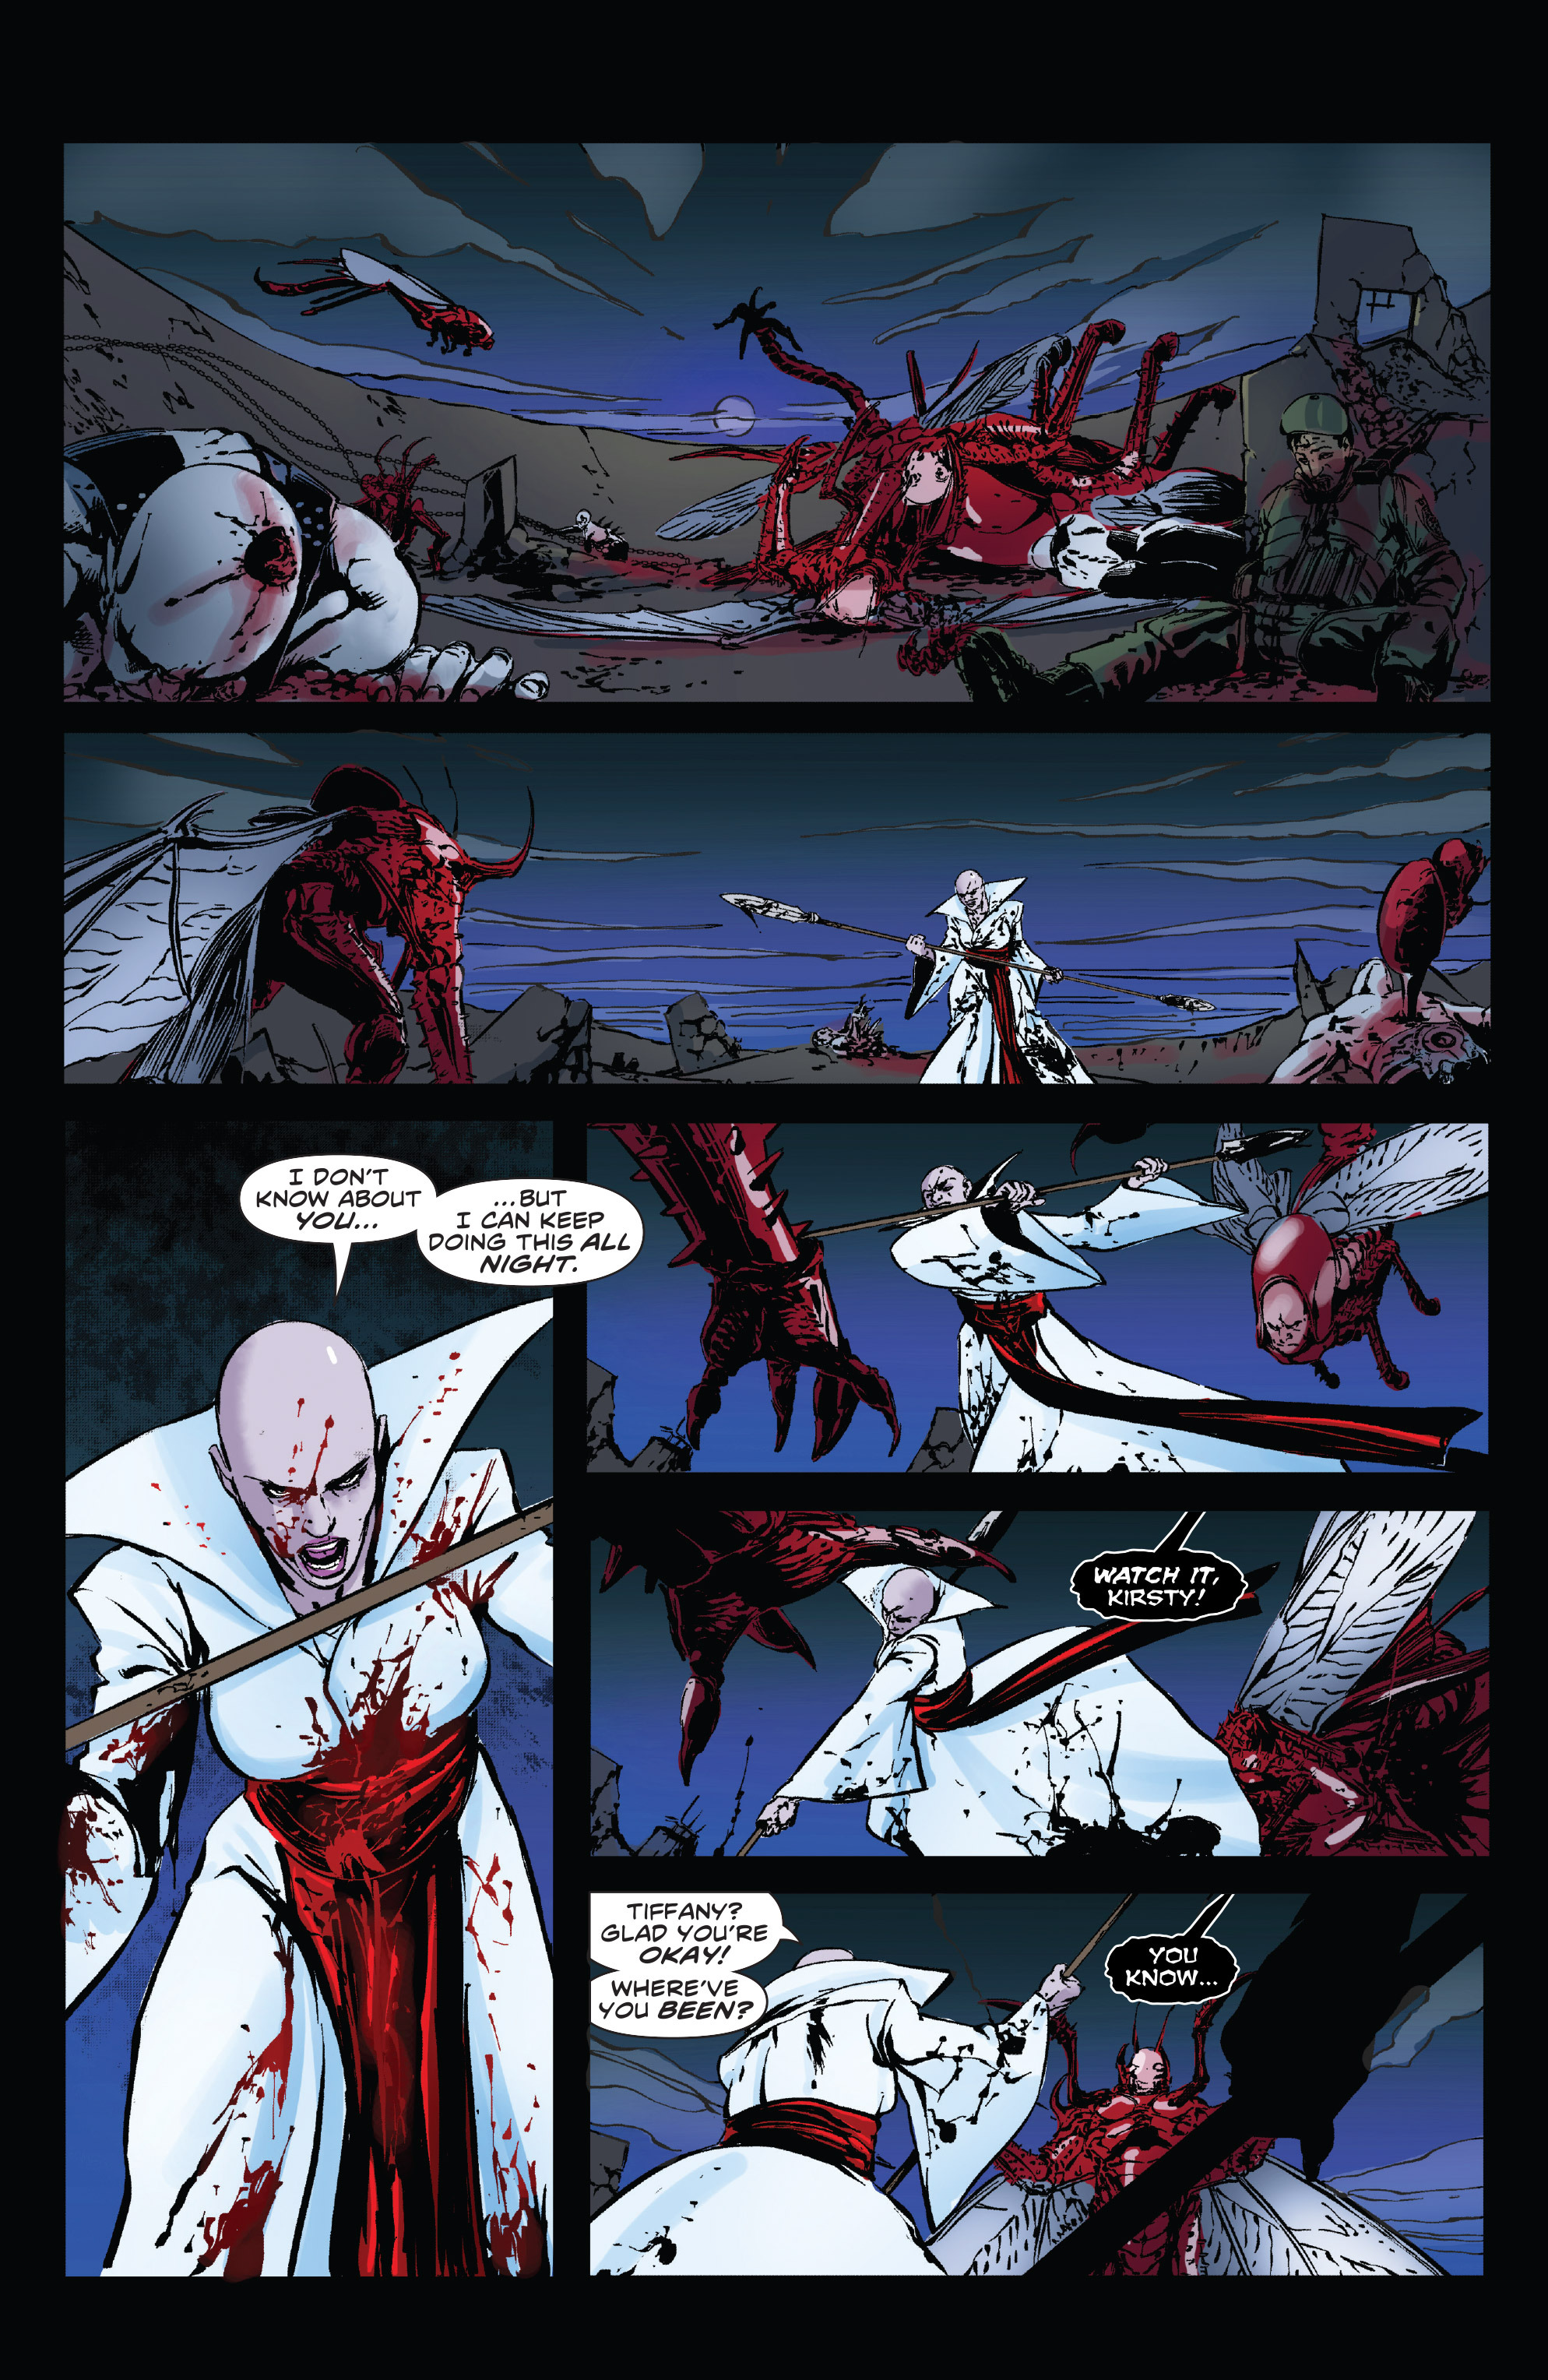 Read online Clive Barker's Hellraiser: The Dark Watch comic -  Issue # TPB 3 - 95